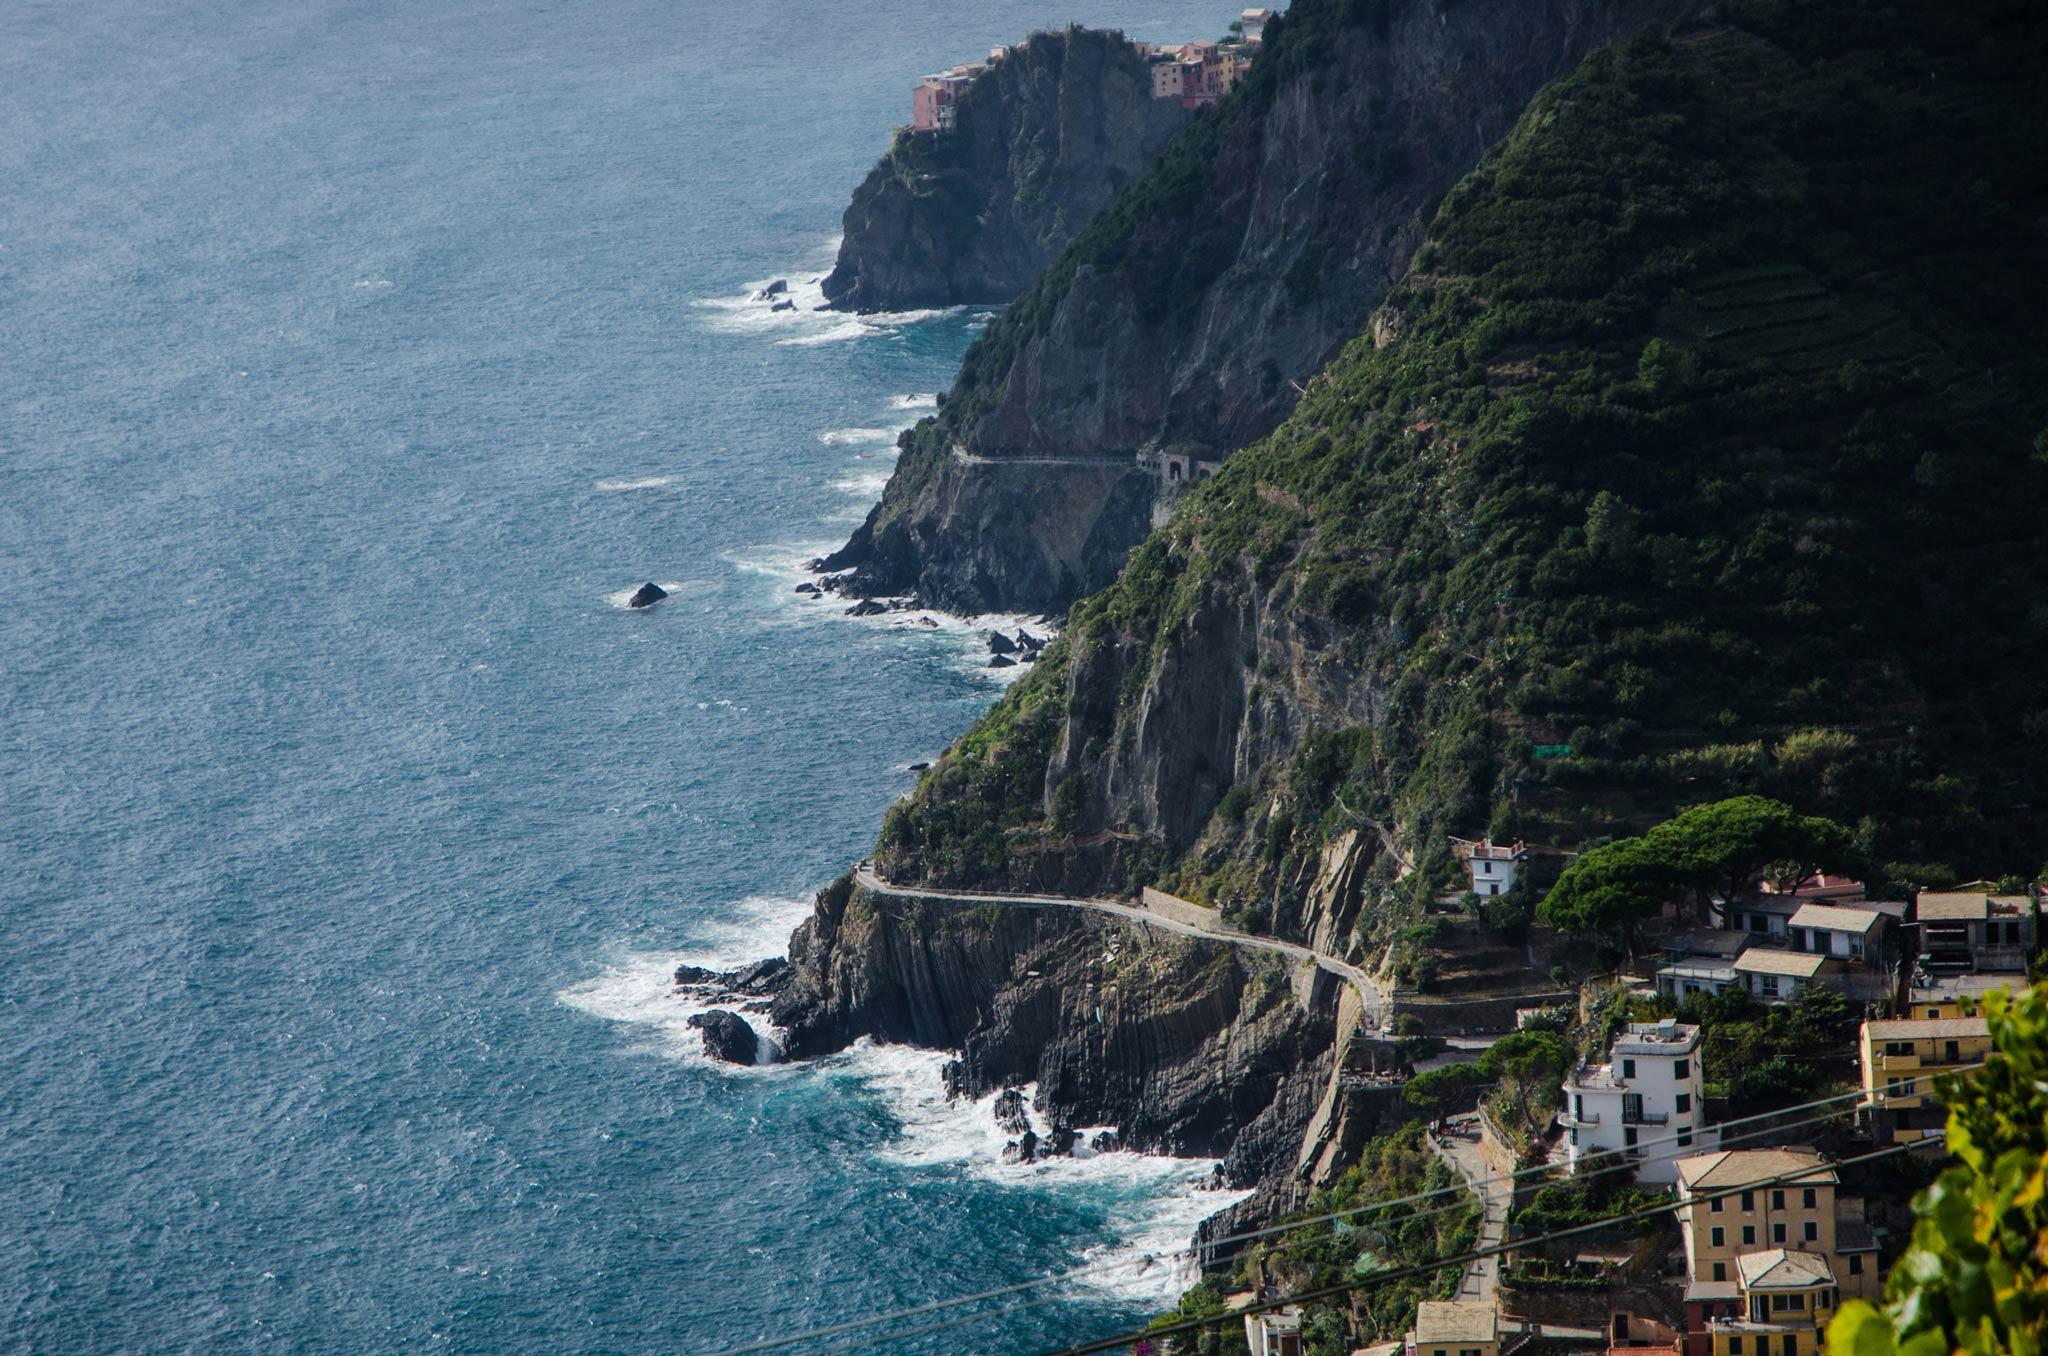 Paesaggi-Italia - Montagne Riomaggiore Cinque Terre Liguria - Riomaggiore_Cinque-Terre_Liguria - Riomaggiore_Cinque-Terre_Liguria